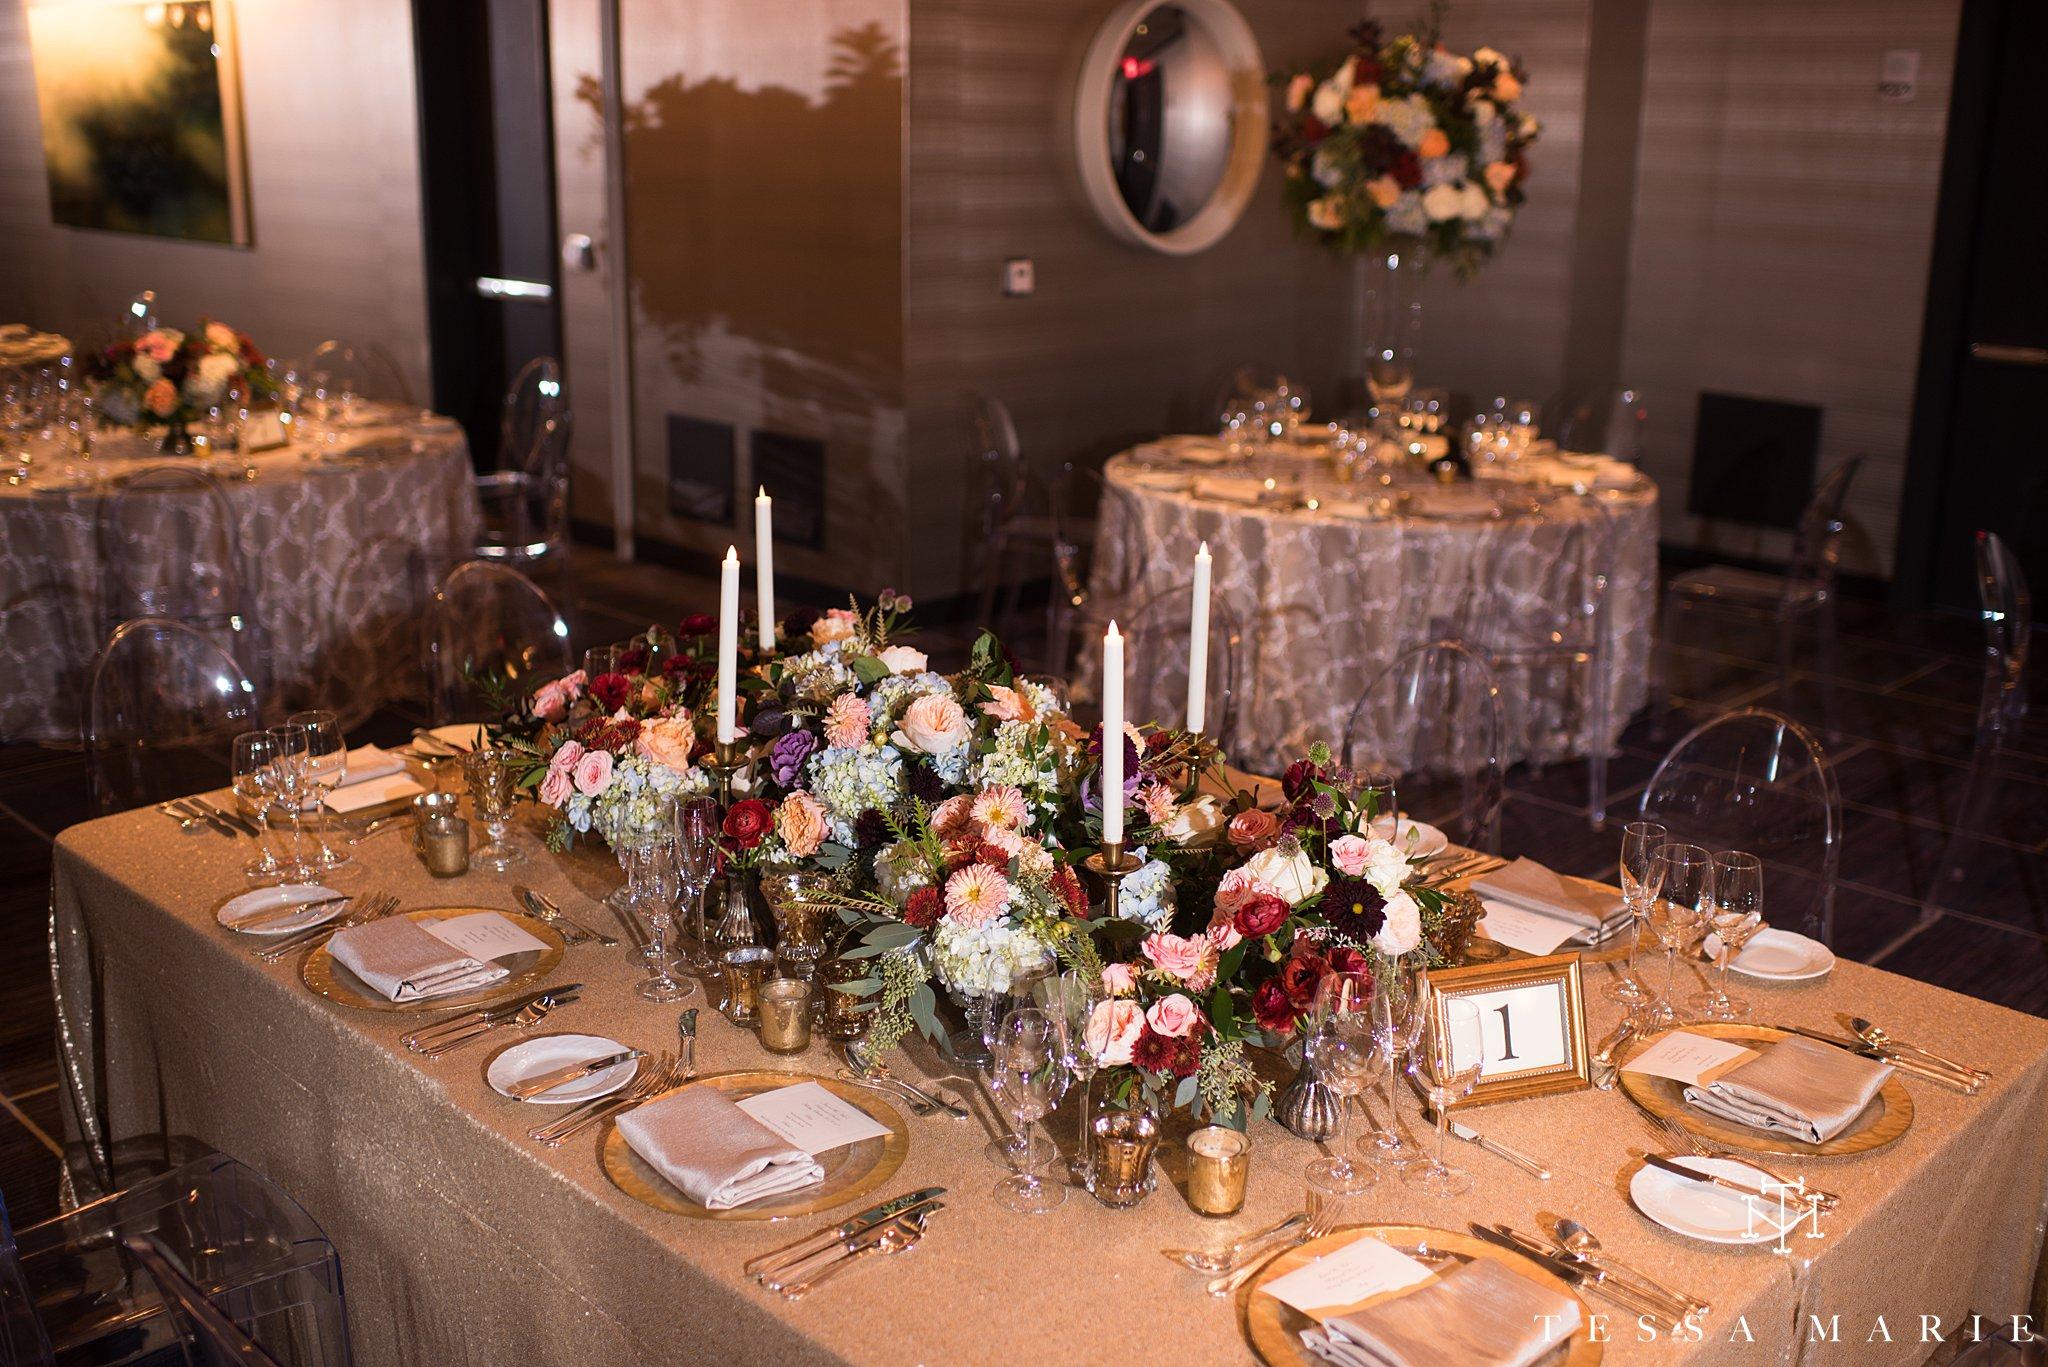 tessa_marie_Weddings_four_seasons_rehersal_dinner_pictures_wedding_atlanta_wedding_getting_married_0013.jpg